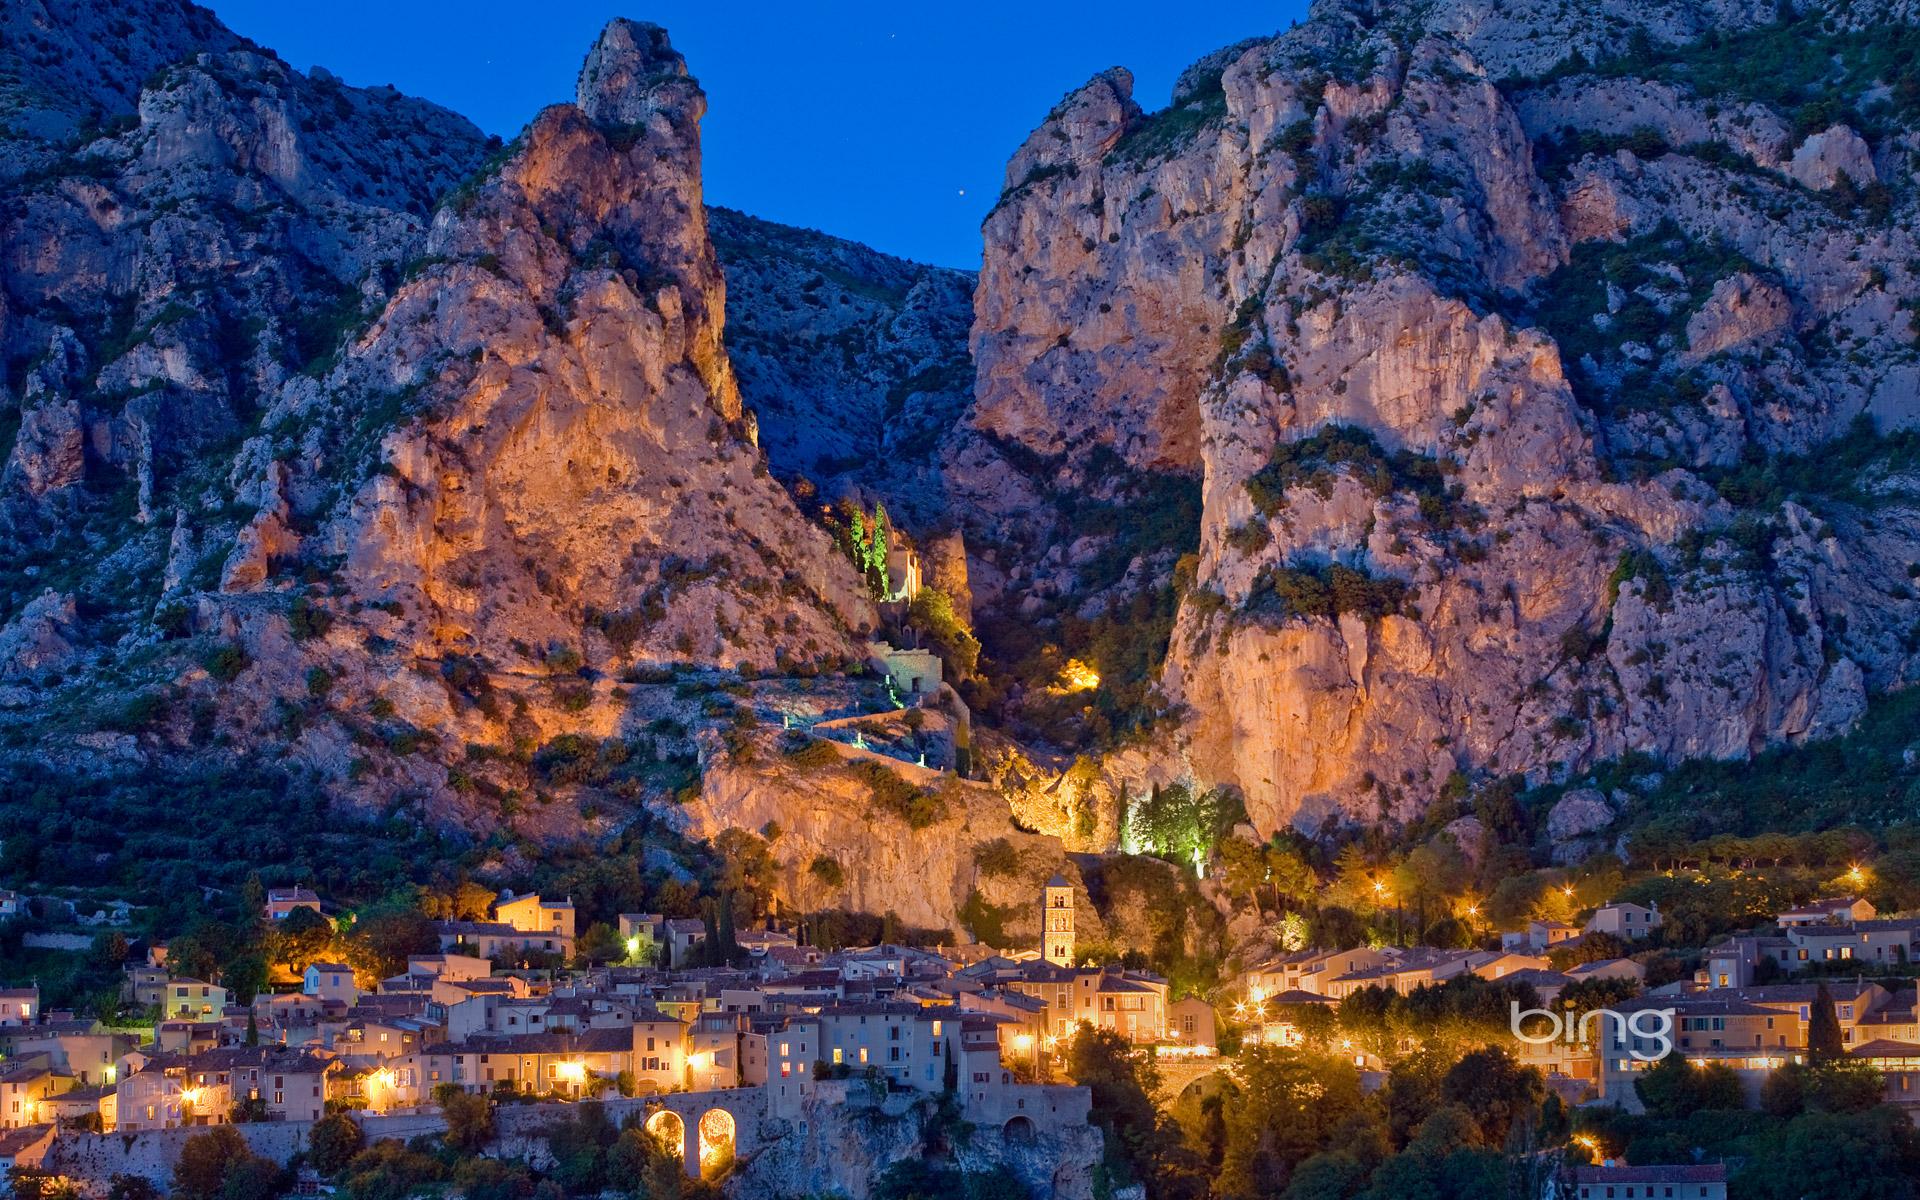 site film x escort alpes de haute provence